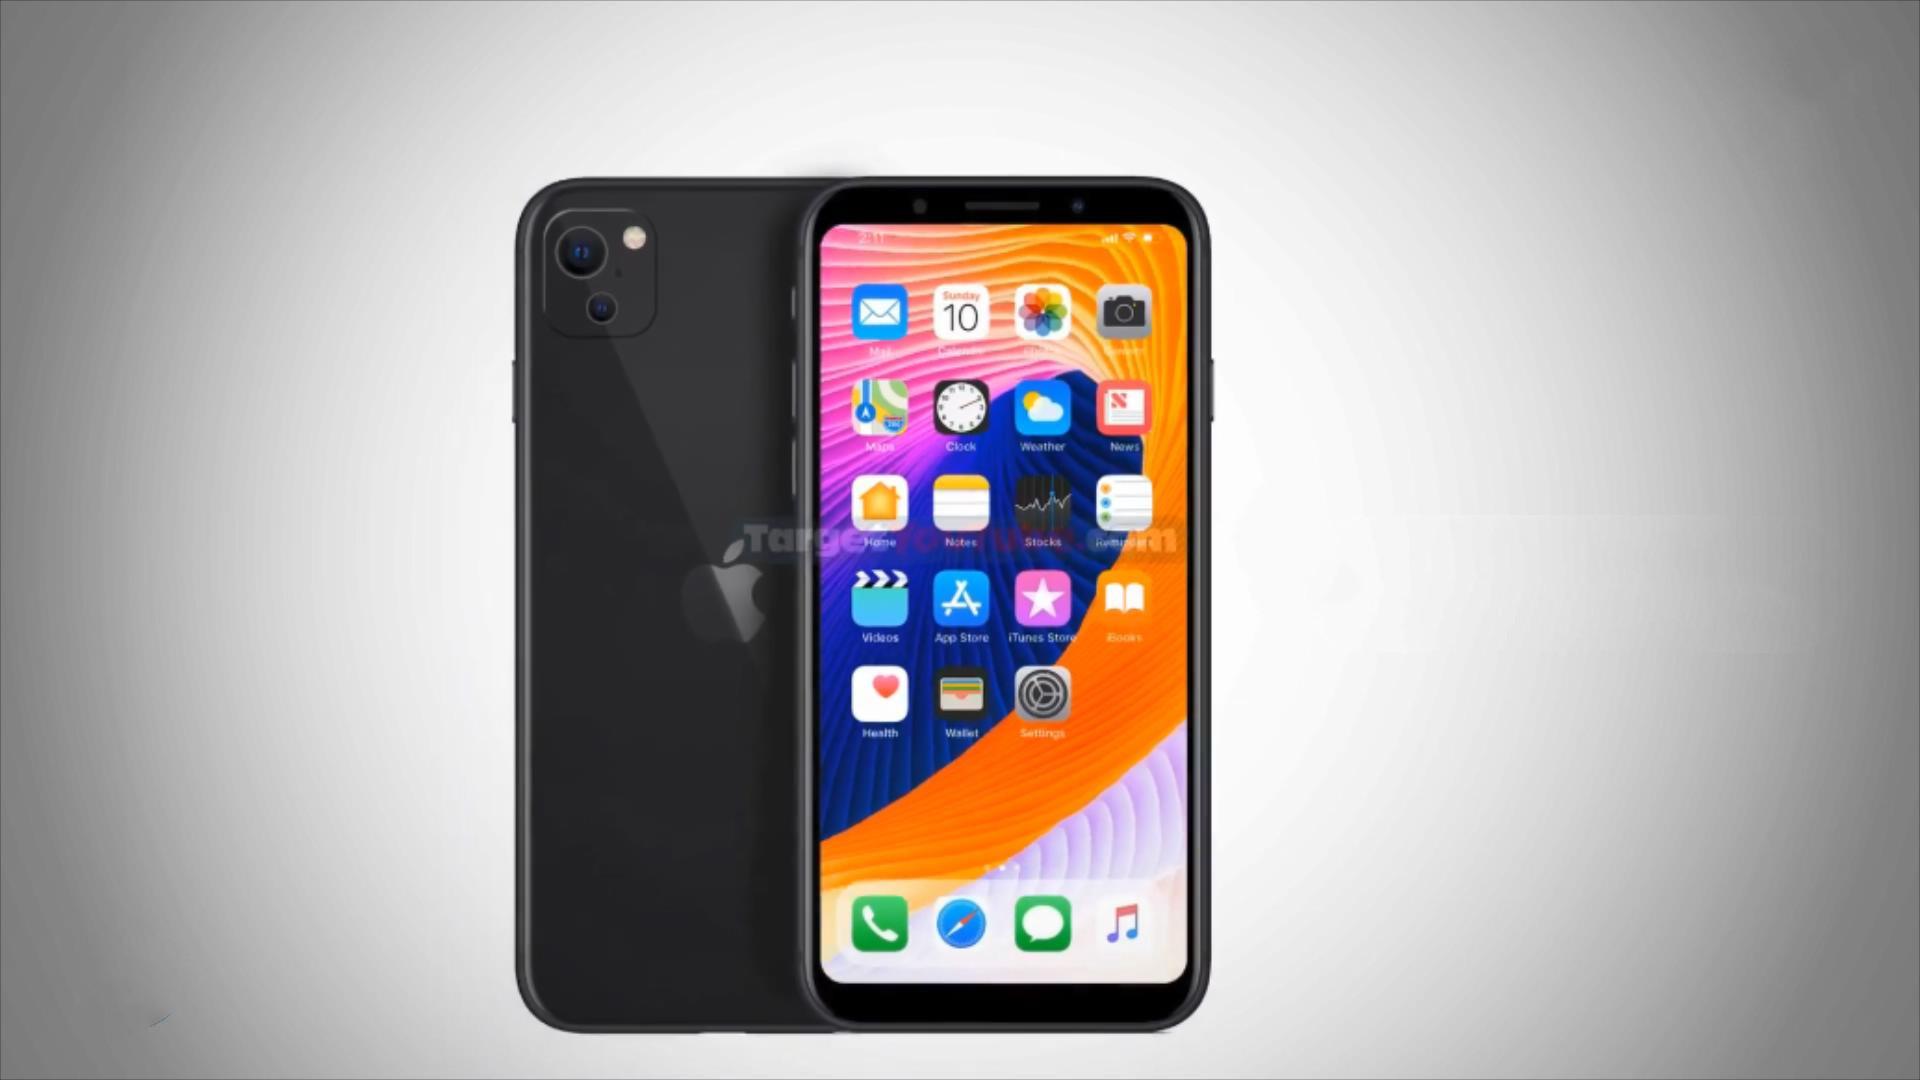 iPhoneSE3概念图:砍刘海窄边框后置双摄,比iPhone11差点意思